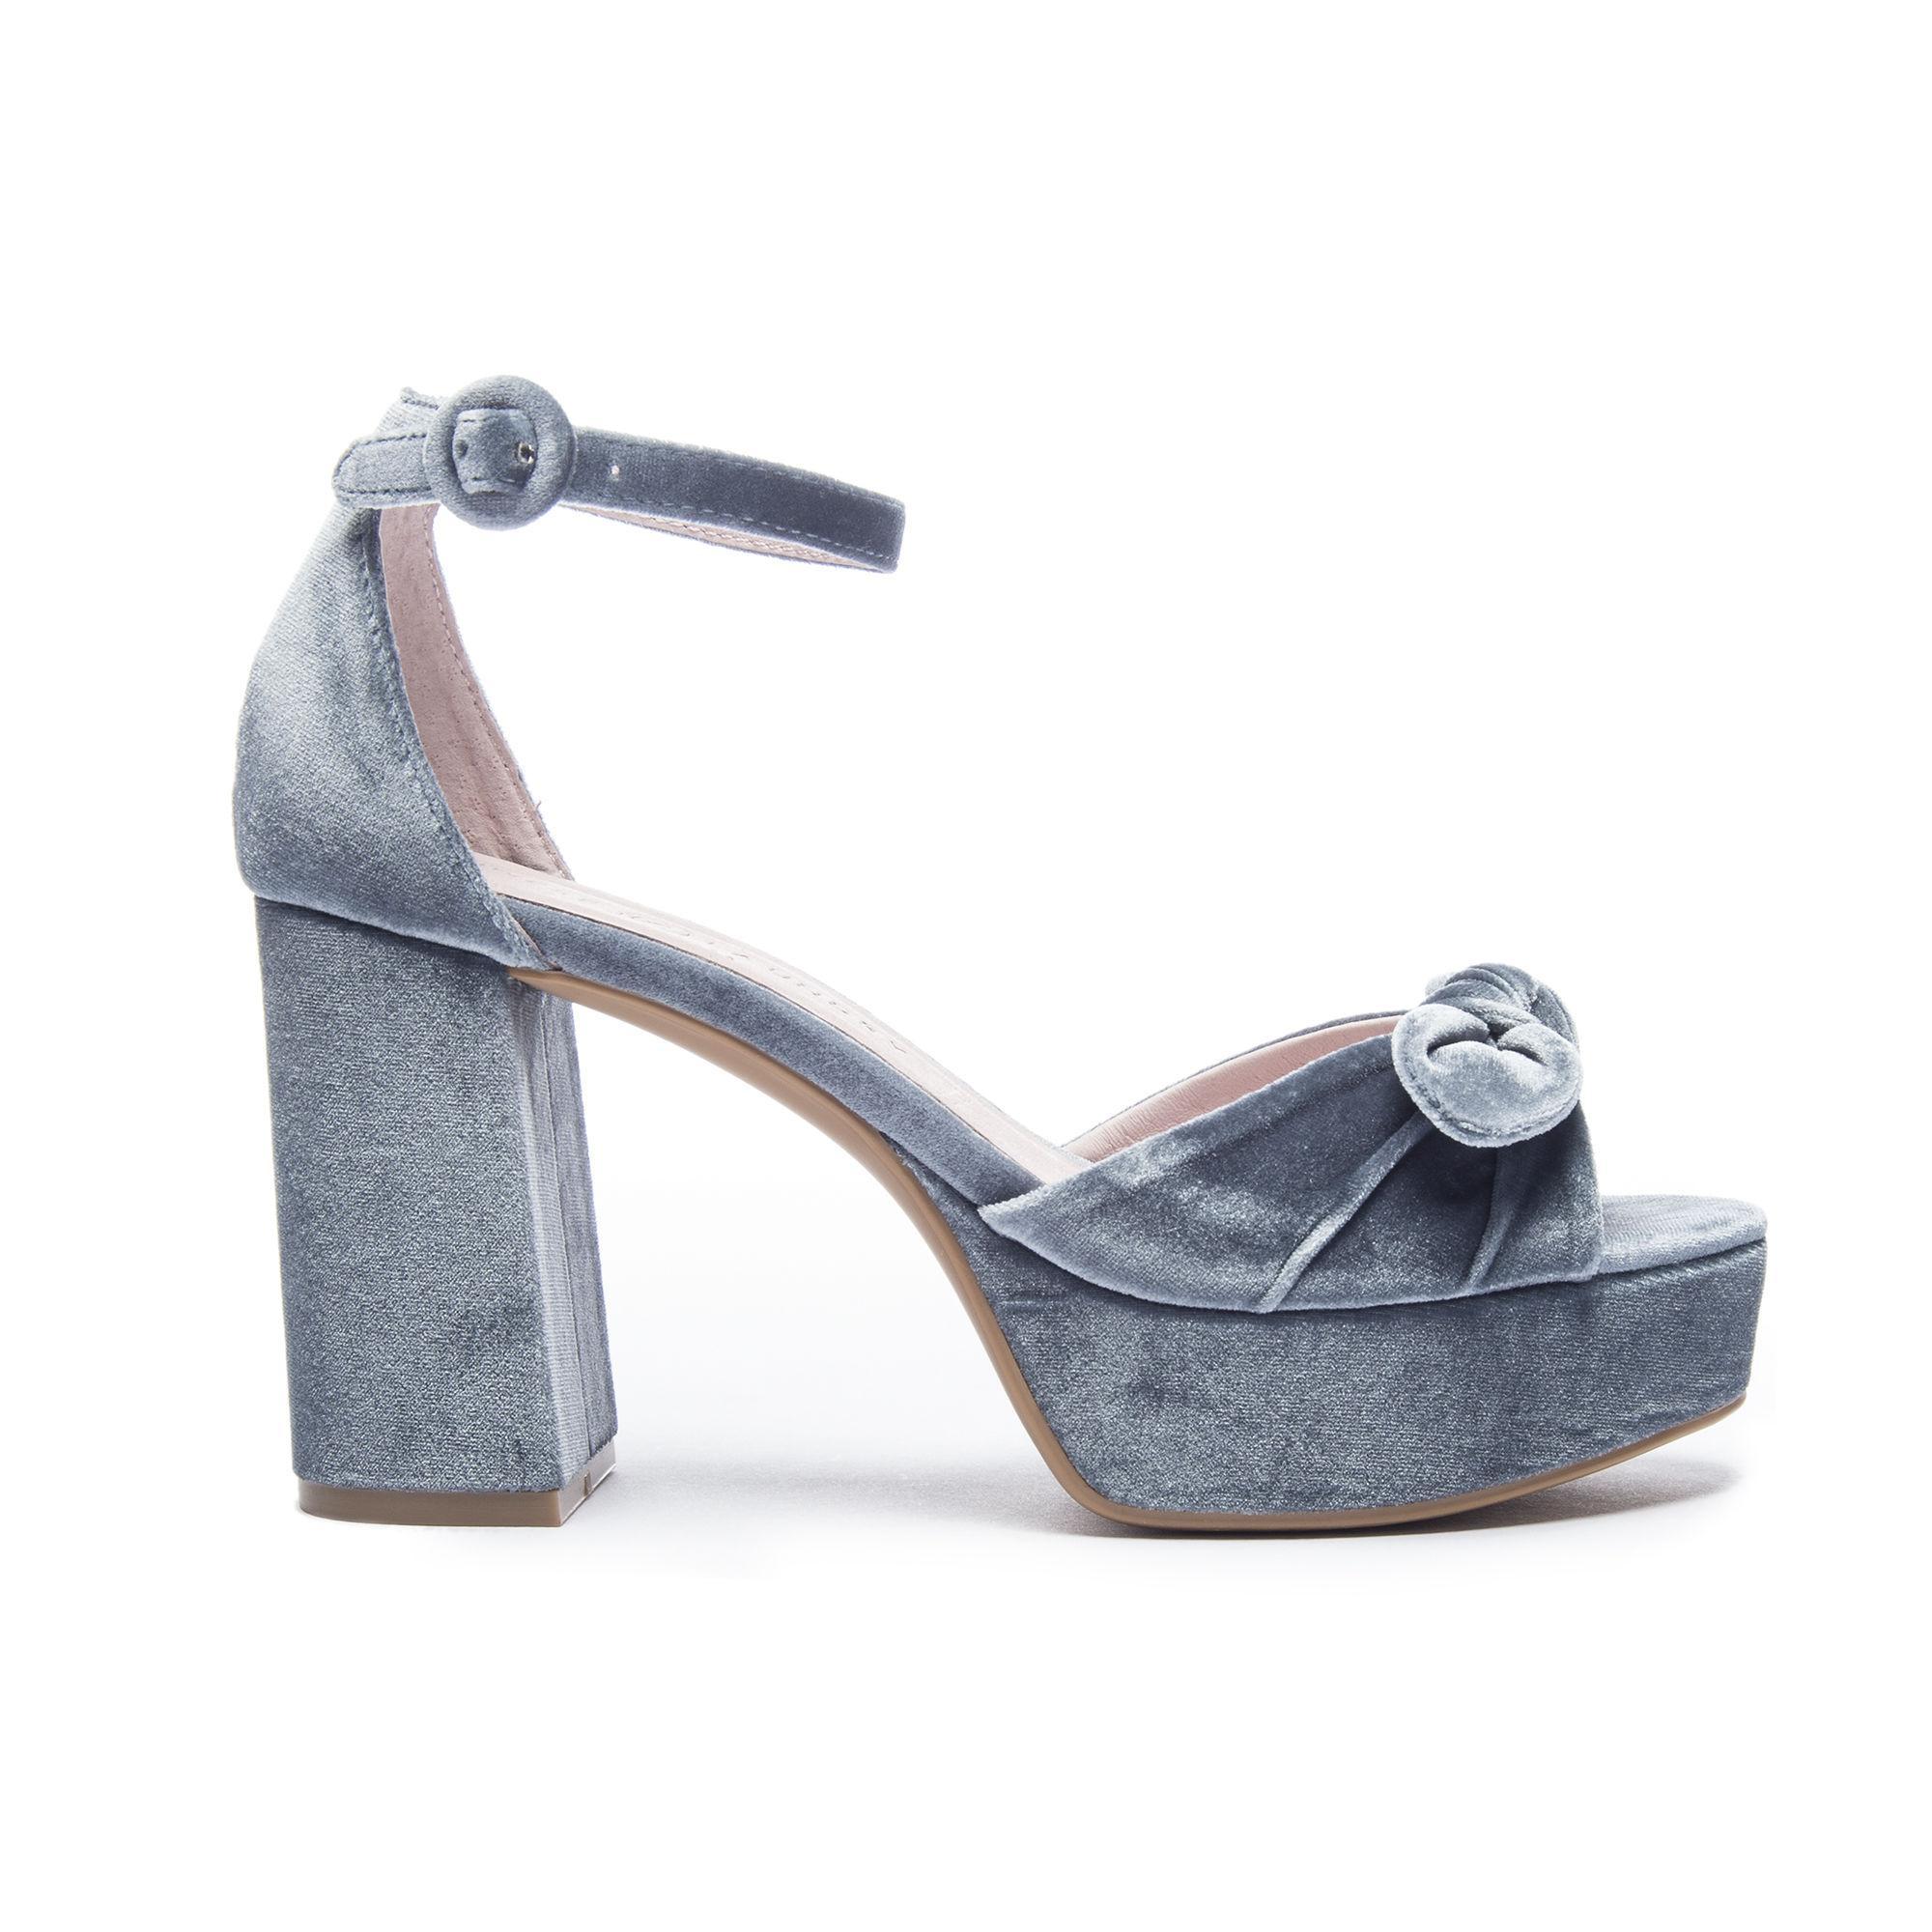 752adfb9632 Lyst - Chinese Laundry Tina Velvet Platform Sandal in Blue